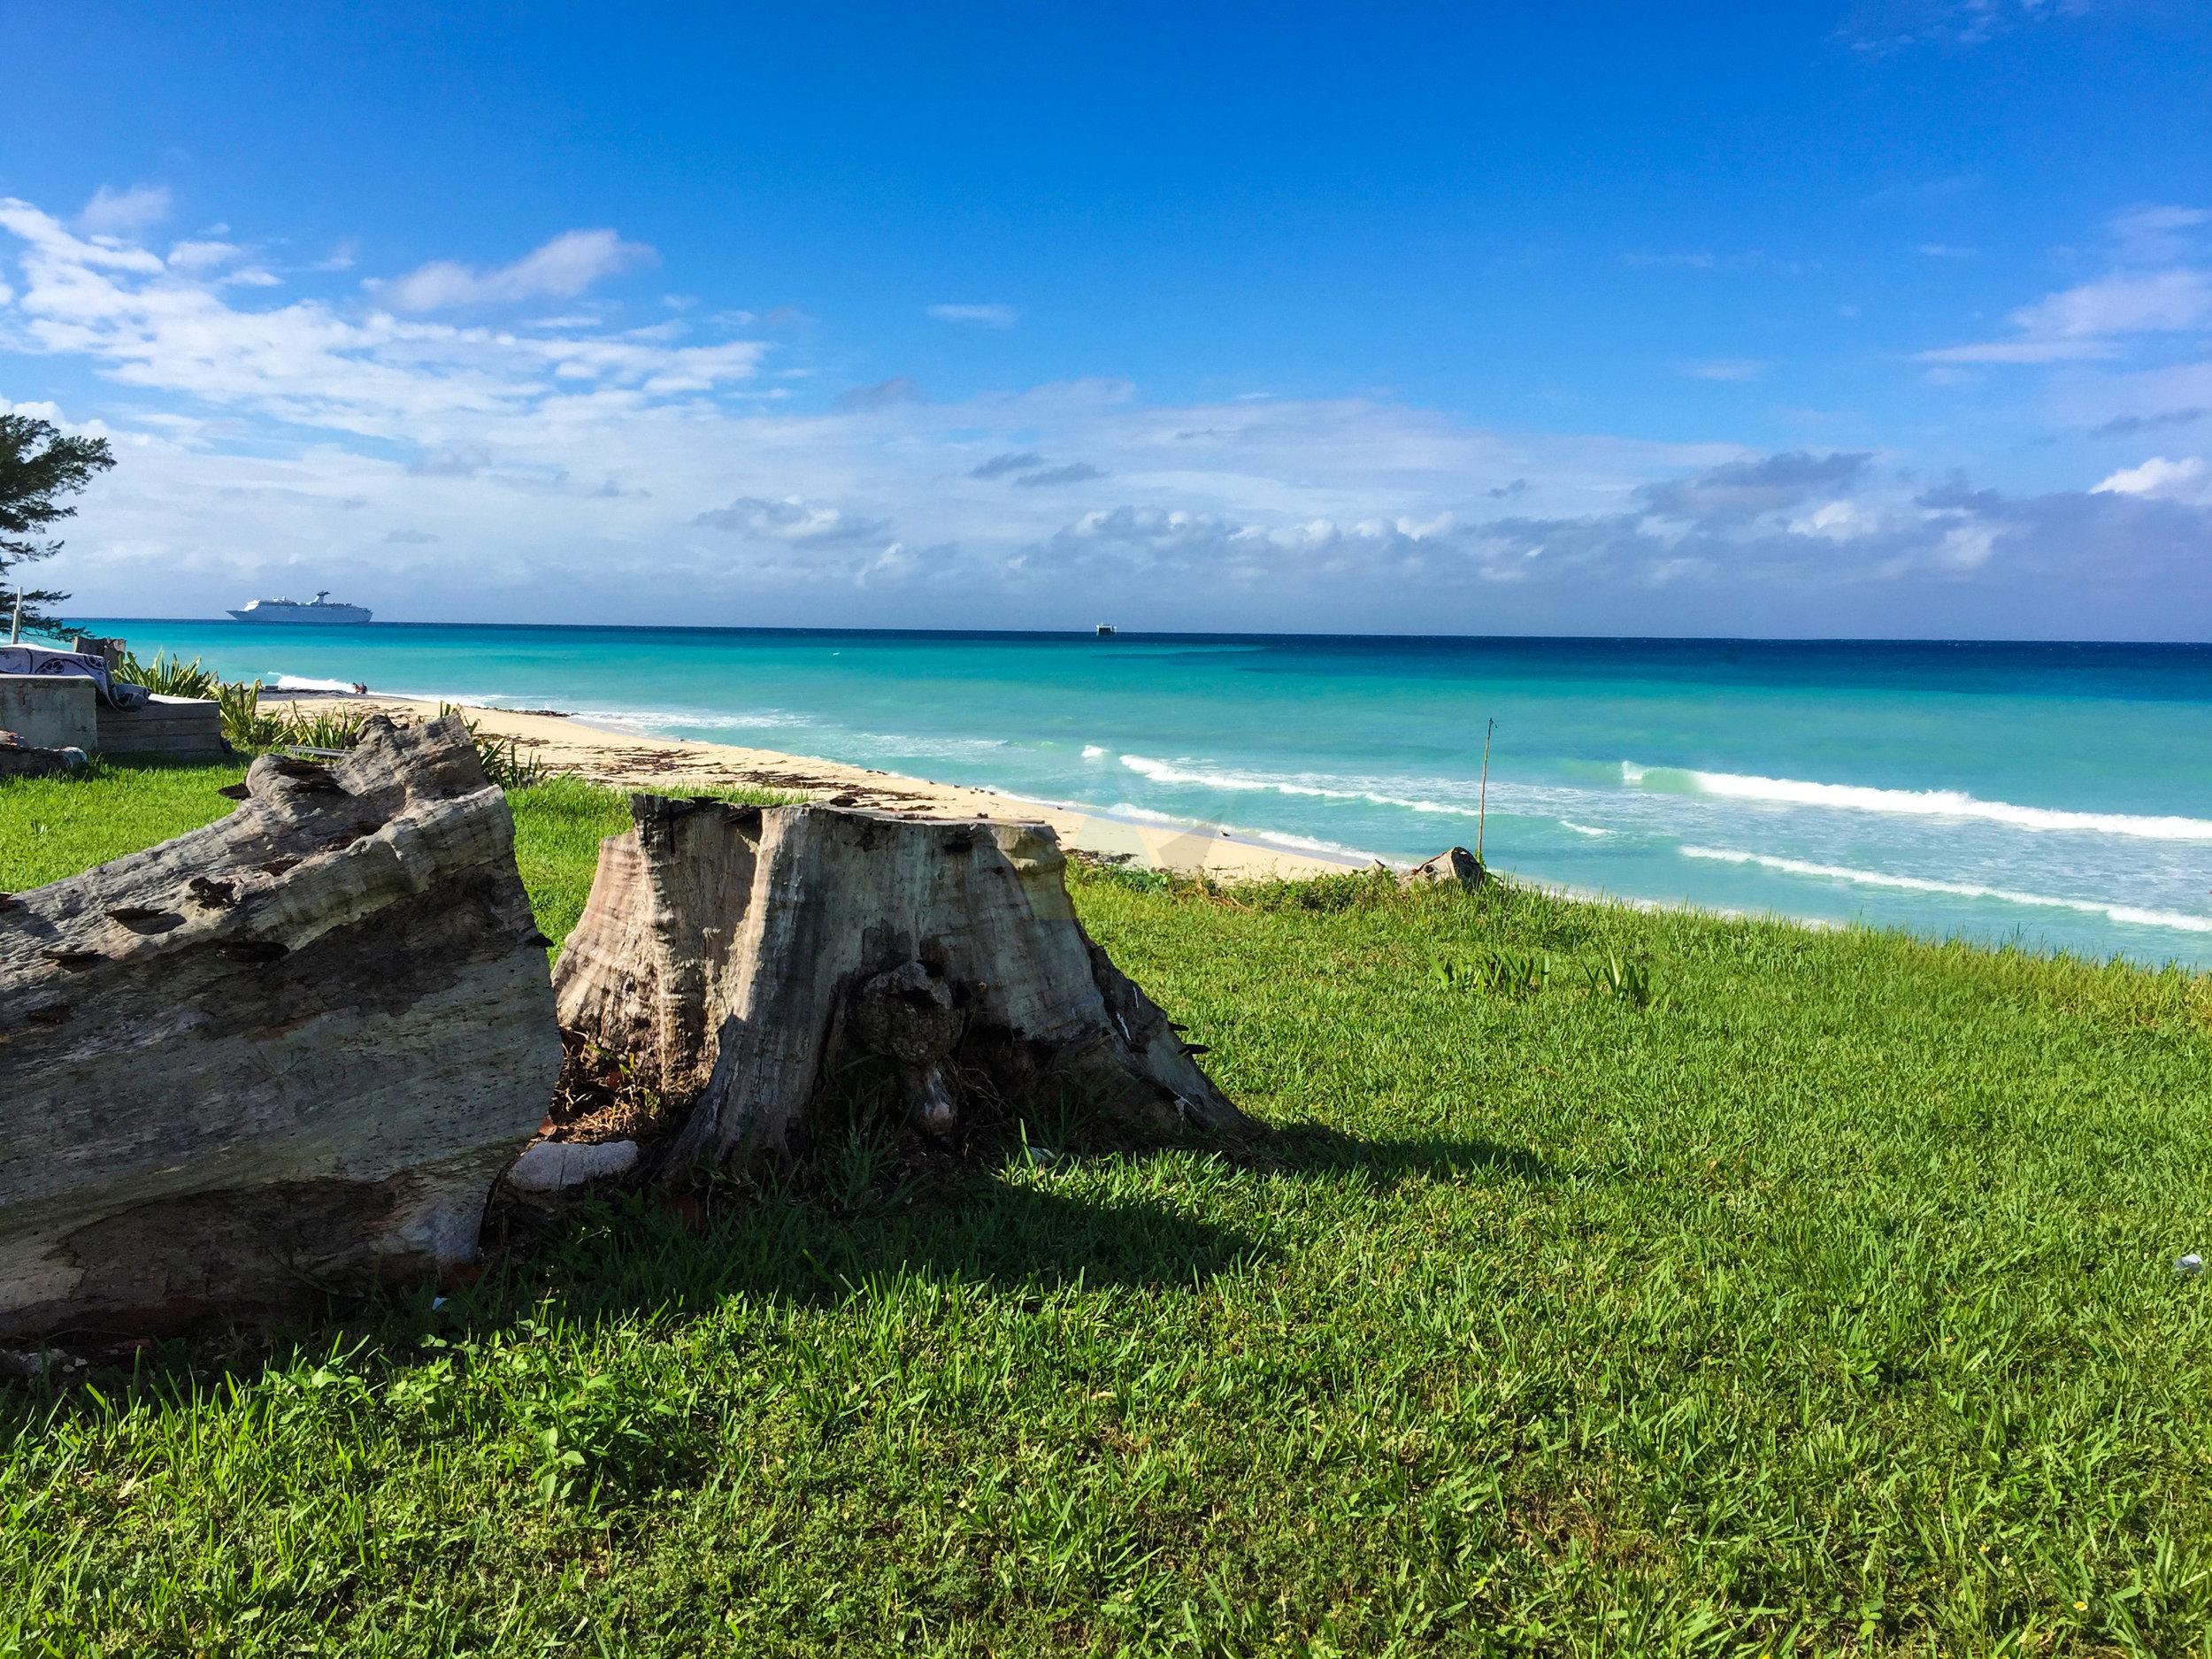 South Bimini Beach